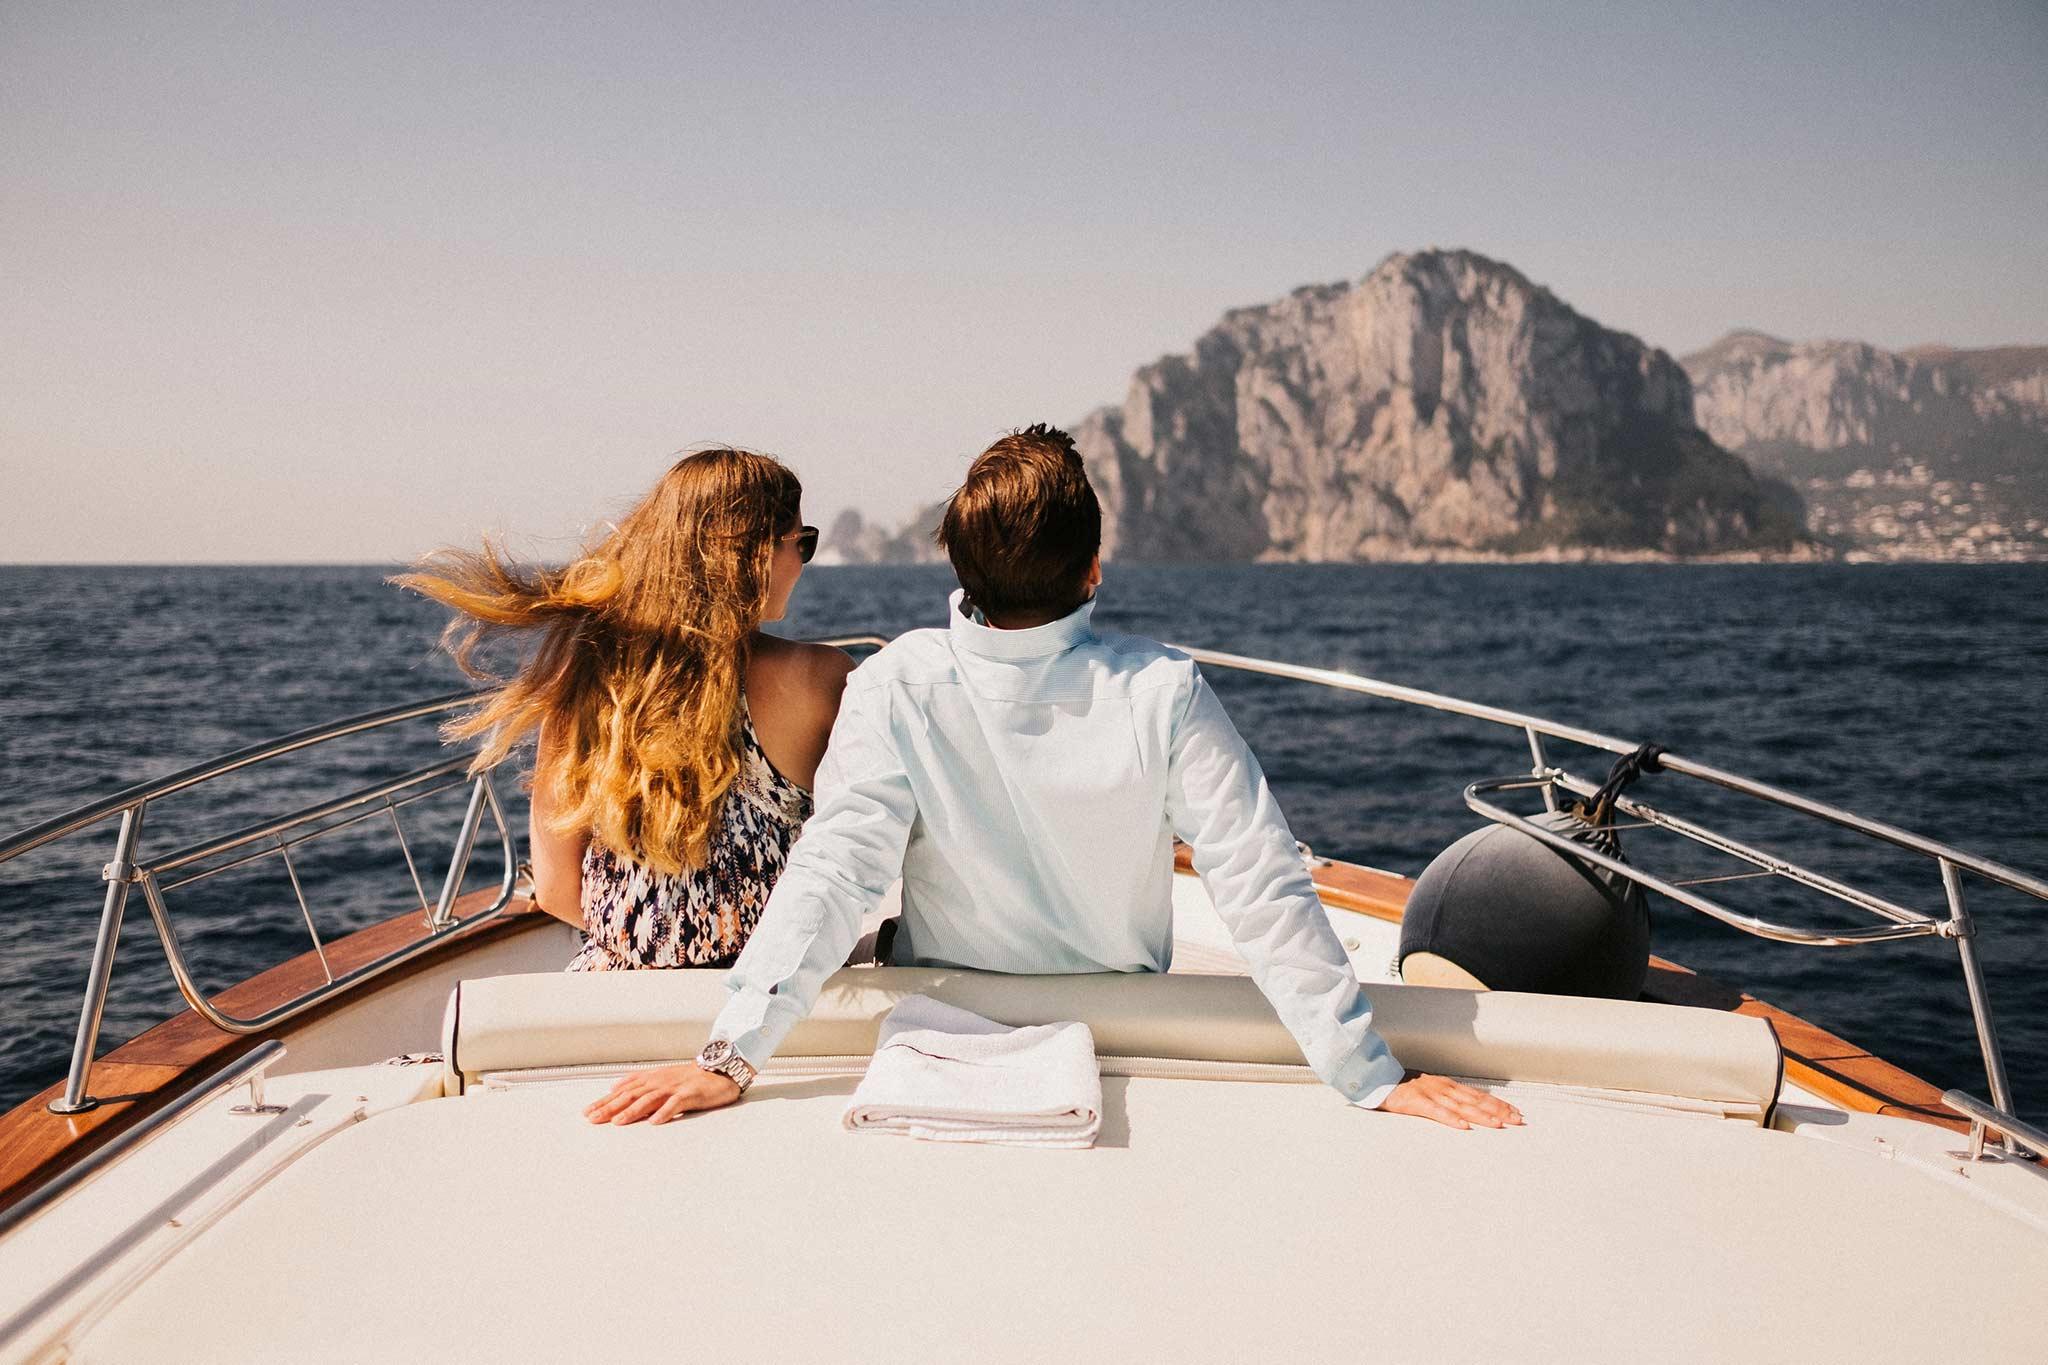 Proposal on boat in Capri island - Joanne & Ian · Mary & Maurizio ...